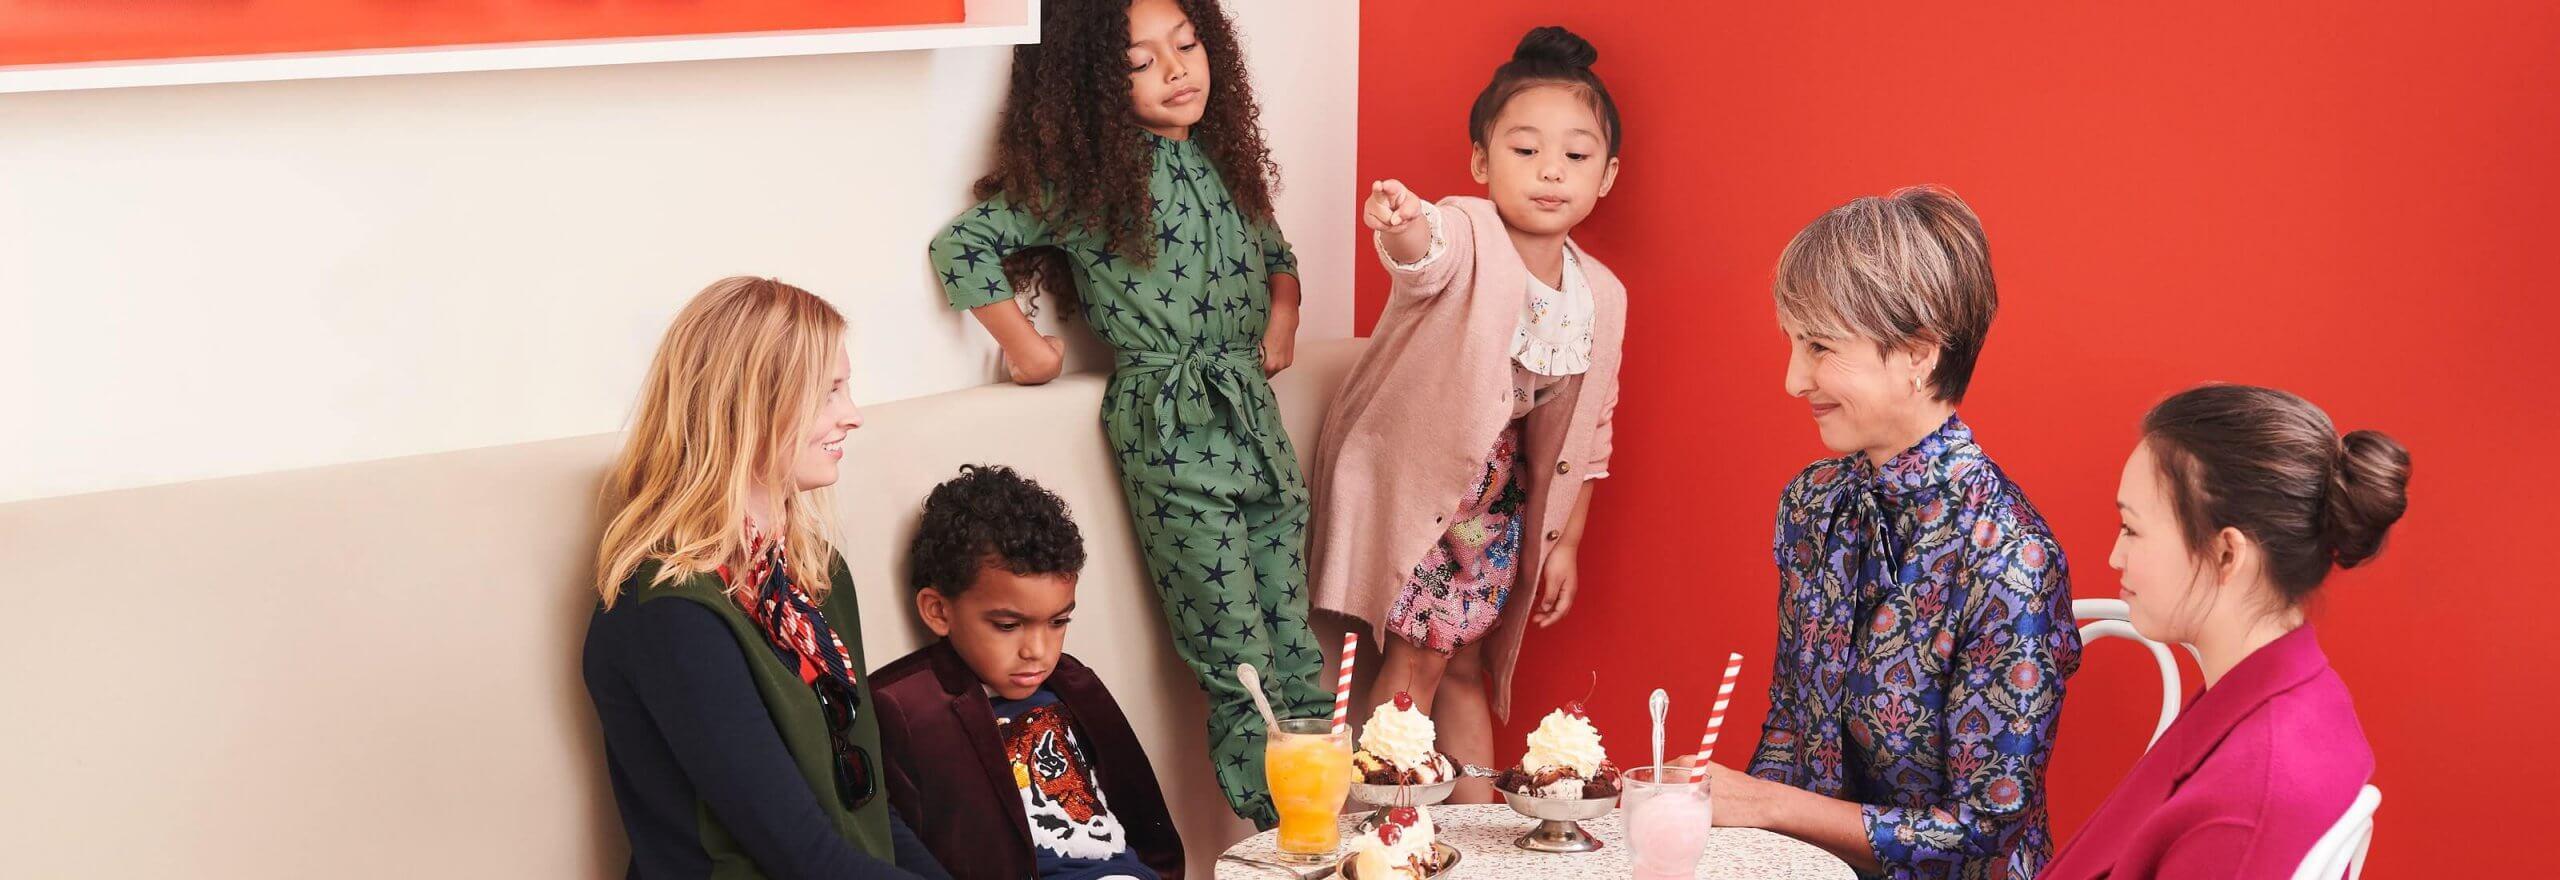 Family eating ice cream